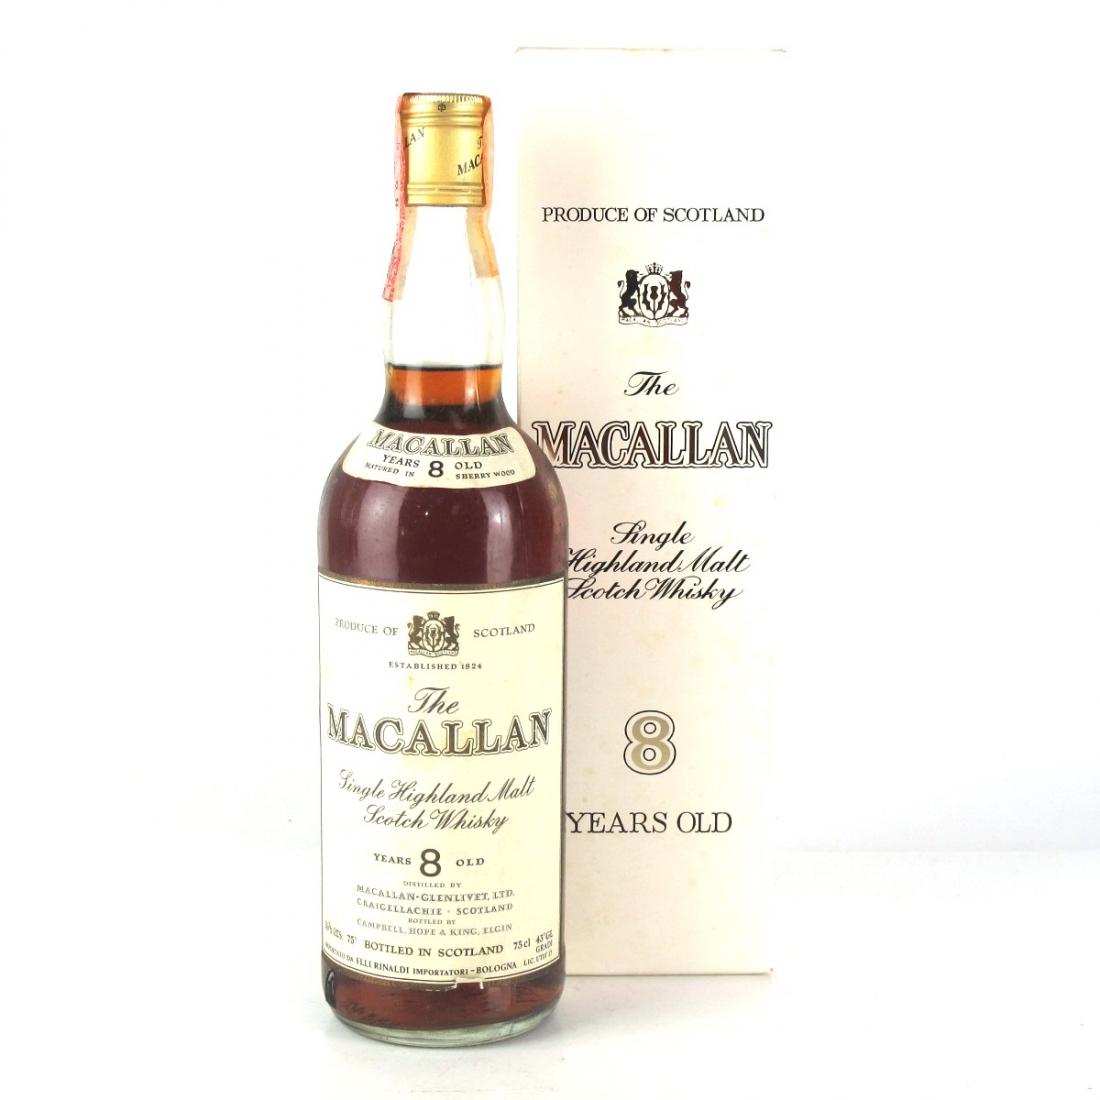 Macallan 8 Year Old 1970s / Rinaldi Import